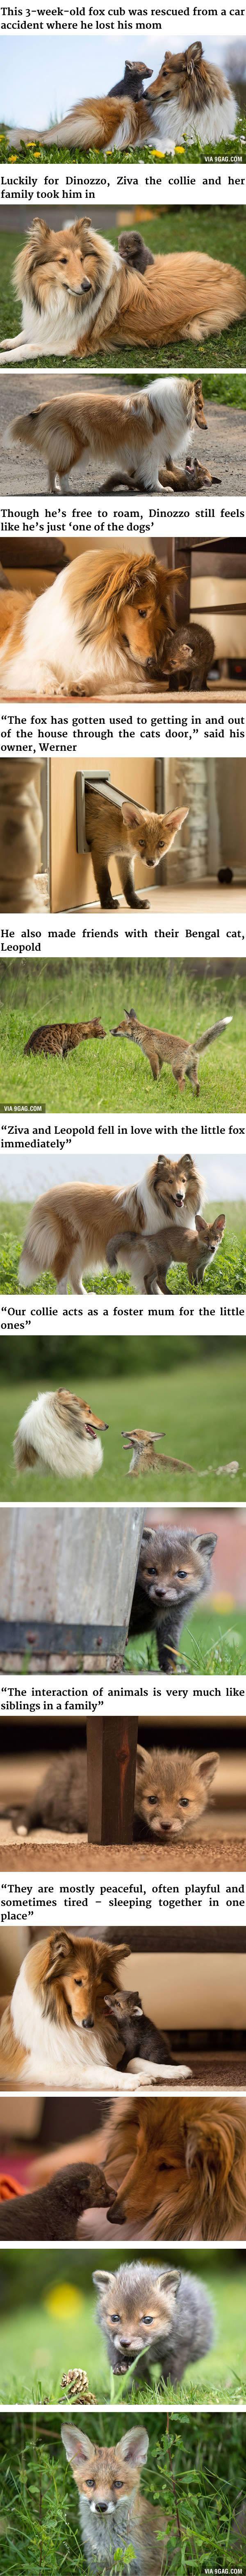 Fox cub taken in by a collie <3